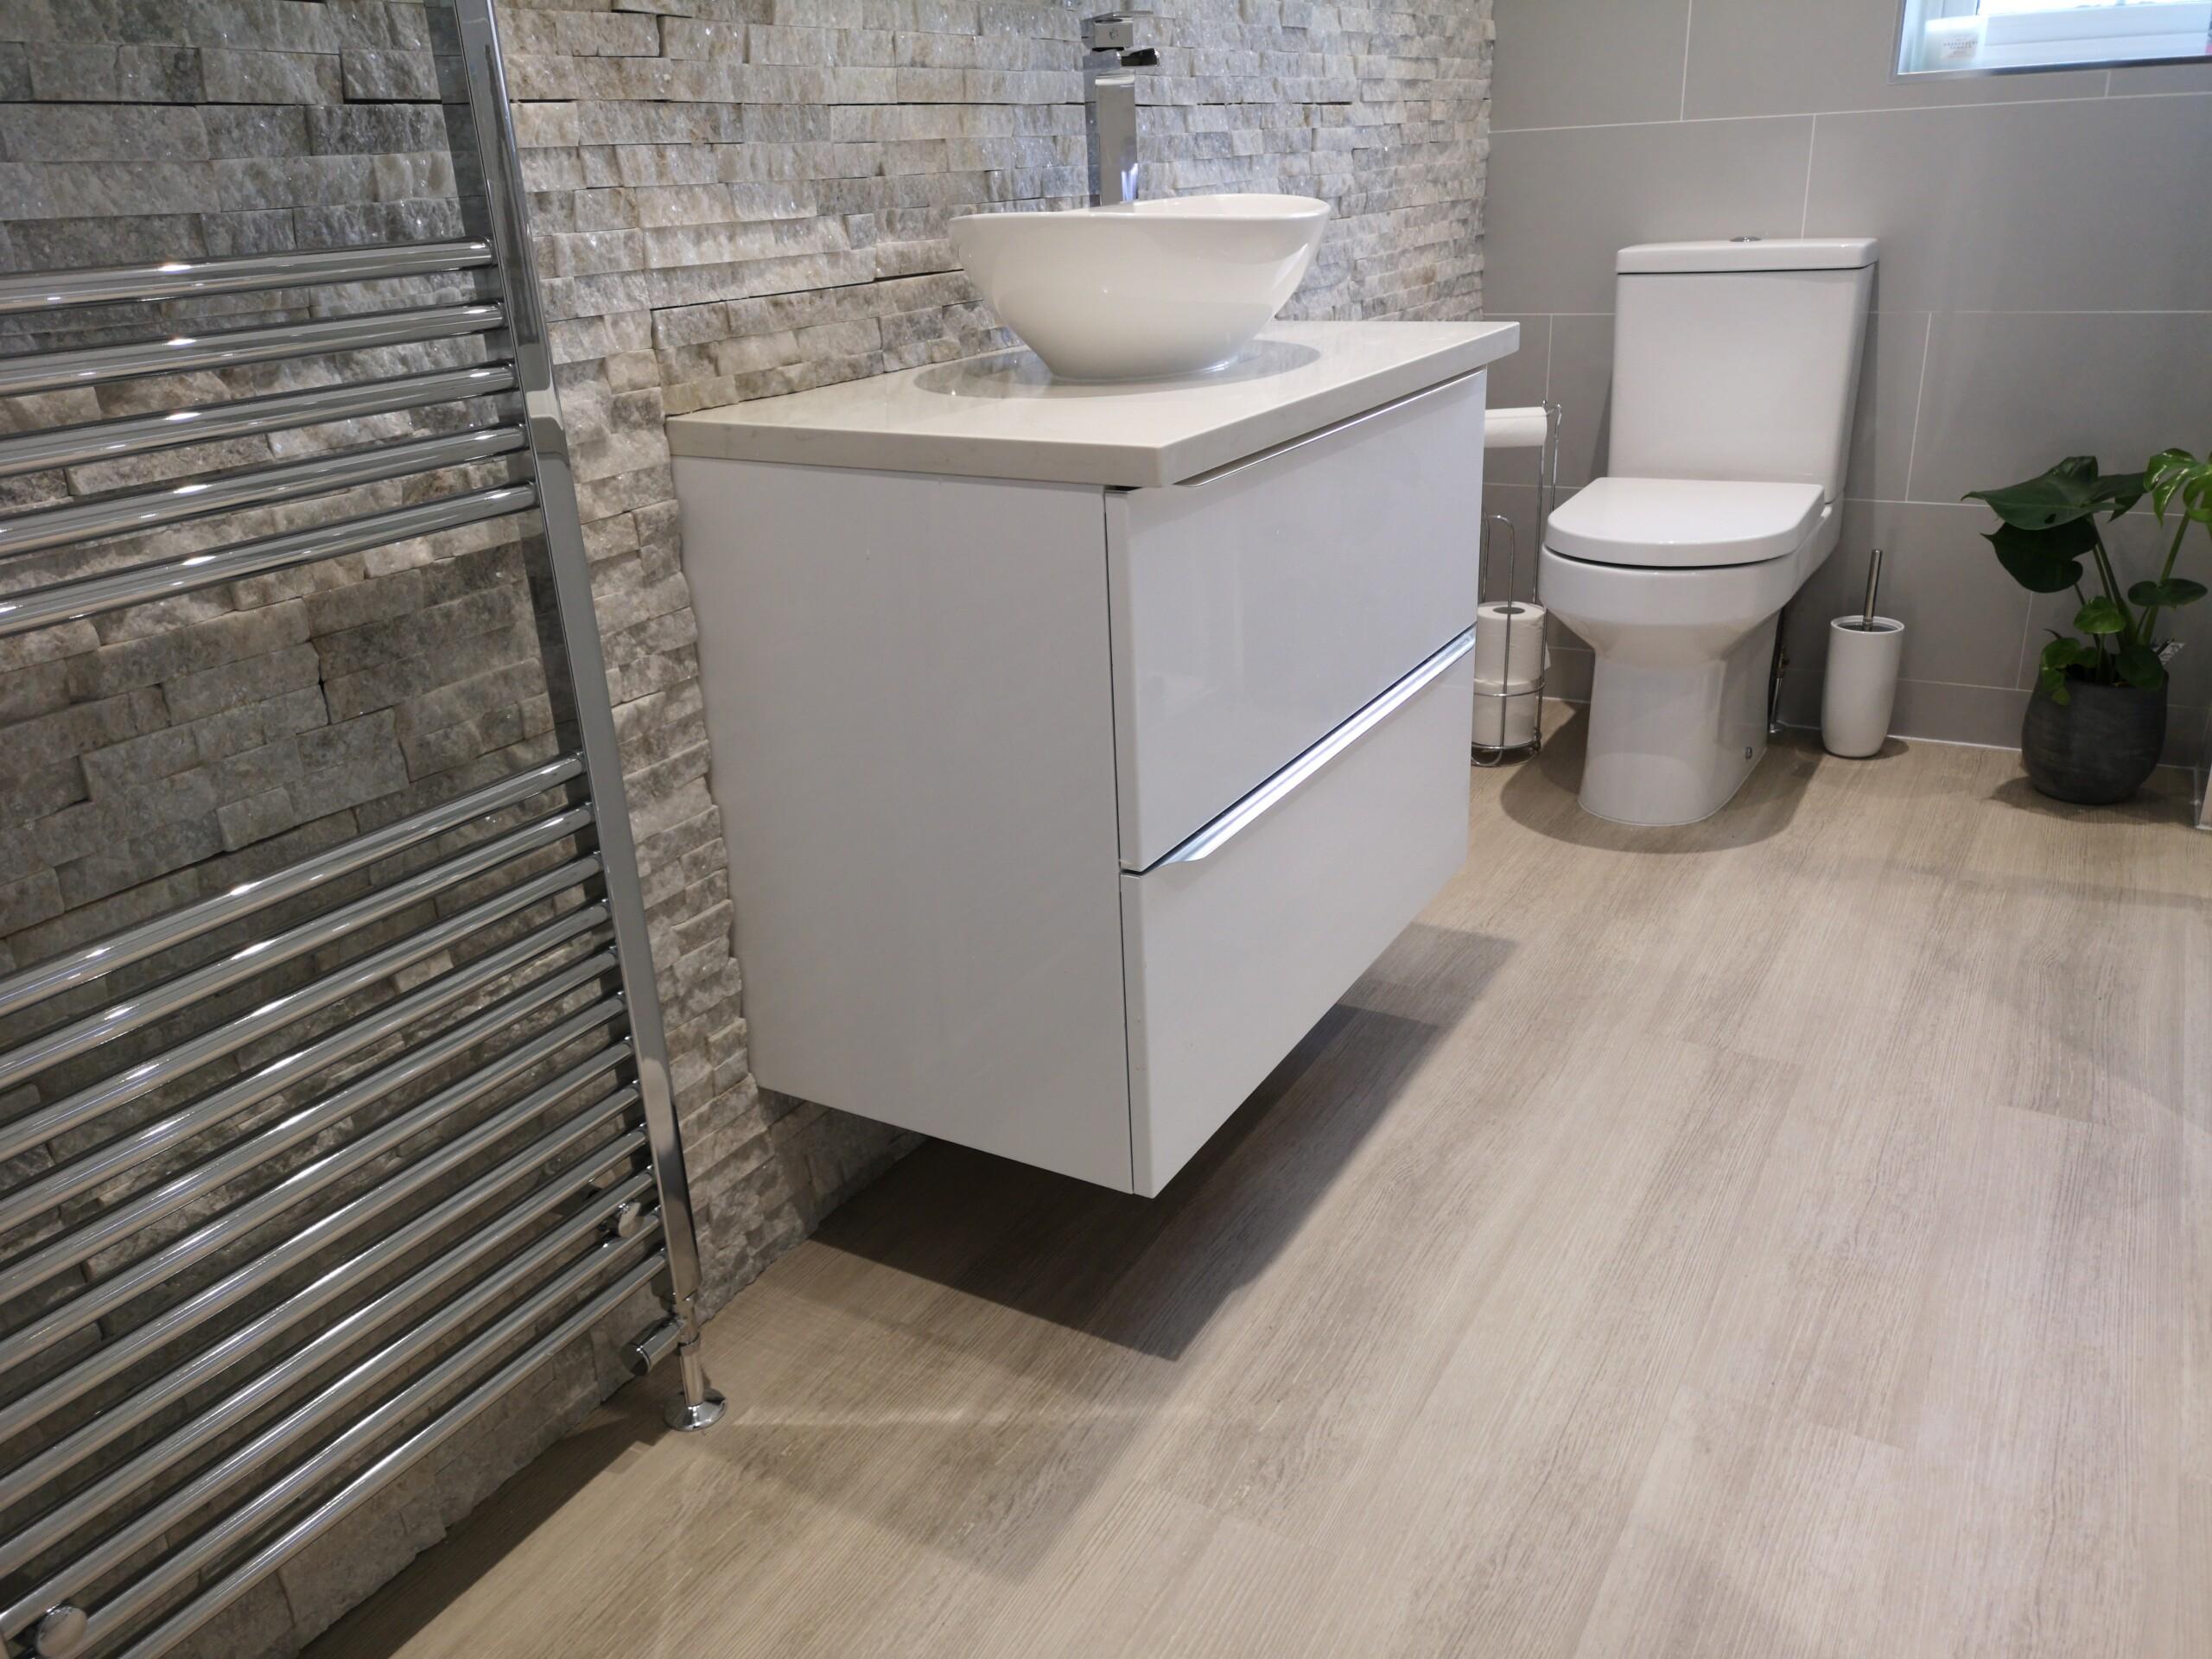 Bathroom Installation by Orbital - Swindon, Wiltshire, Gloucestershire, Bath, Oxford